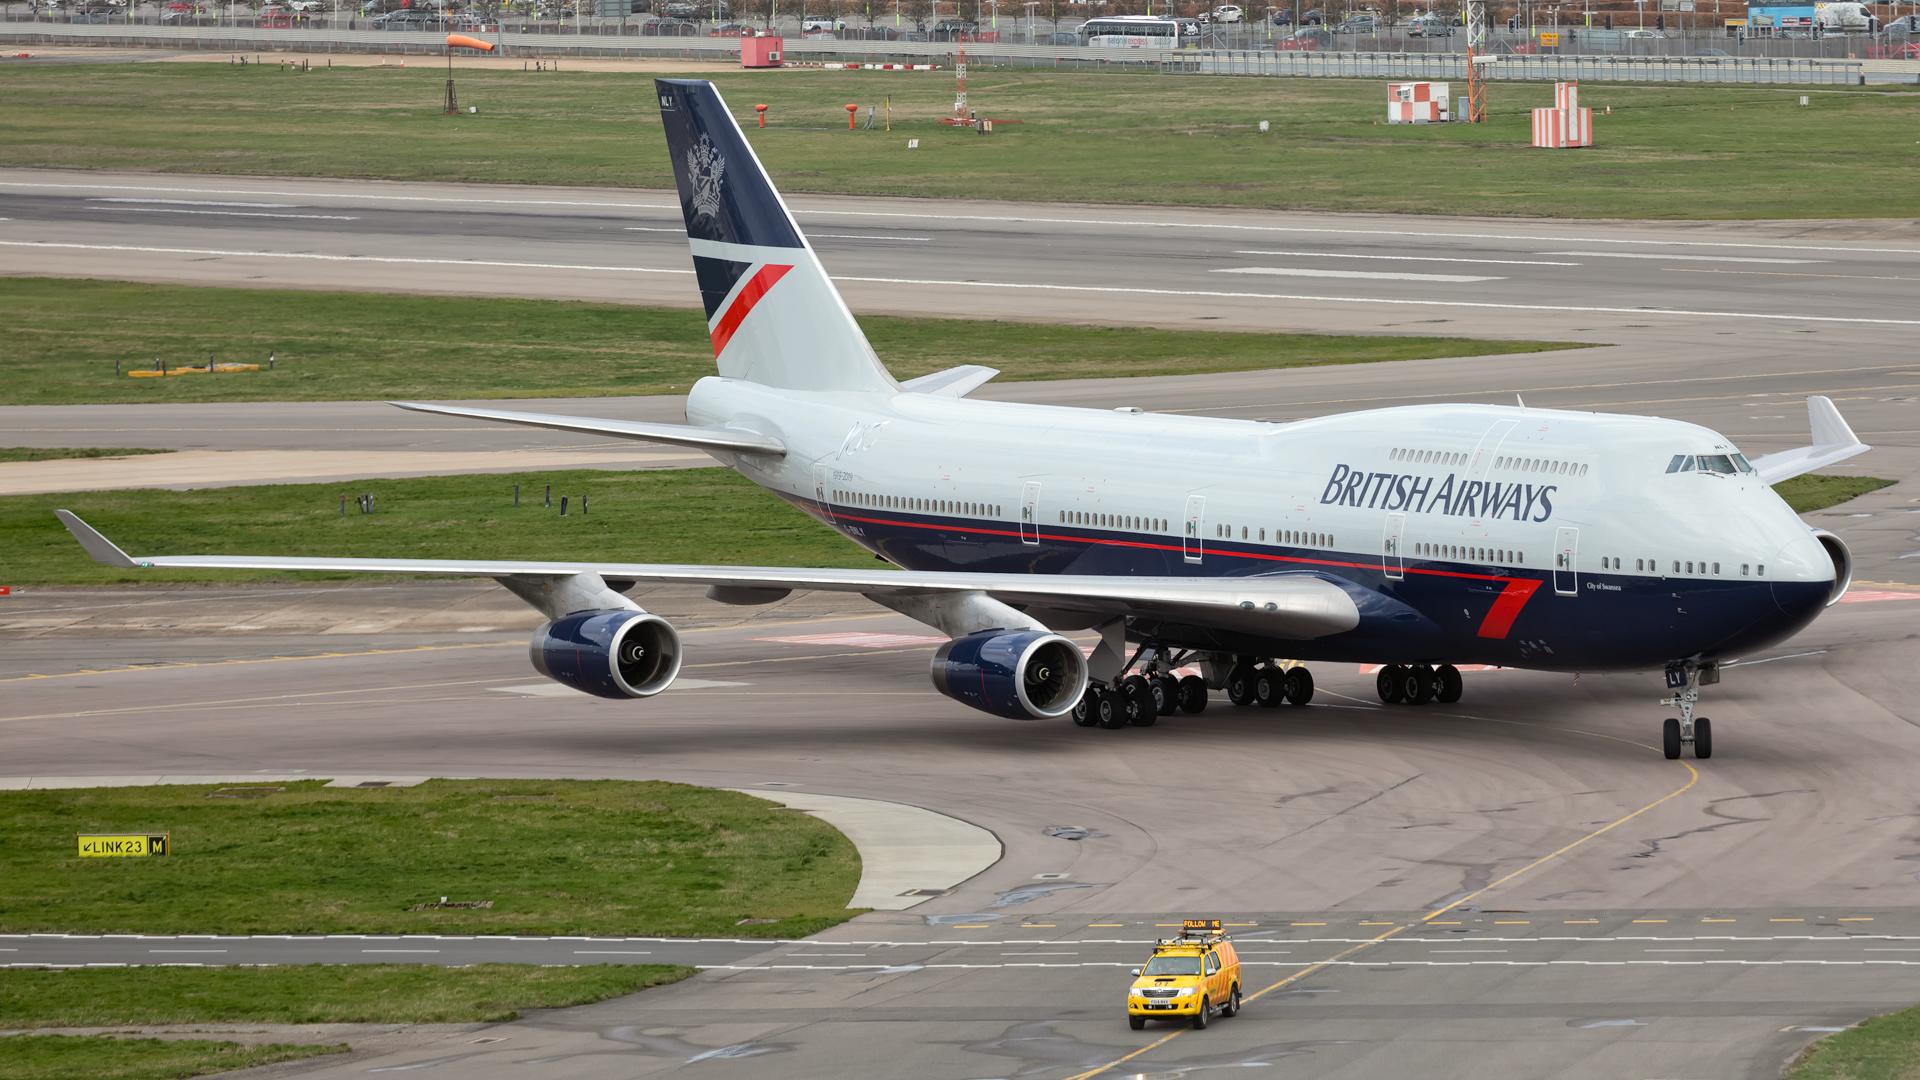 Click image for larger version.  Name:BA-744-Landor-taxiing-2-web.jpg Views:15 Size:1.28 MB ID:22476